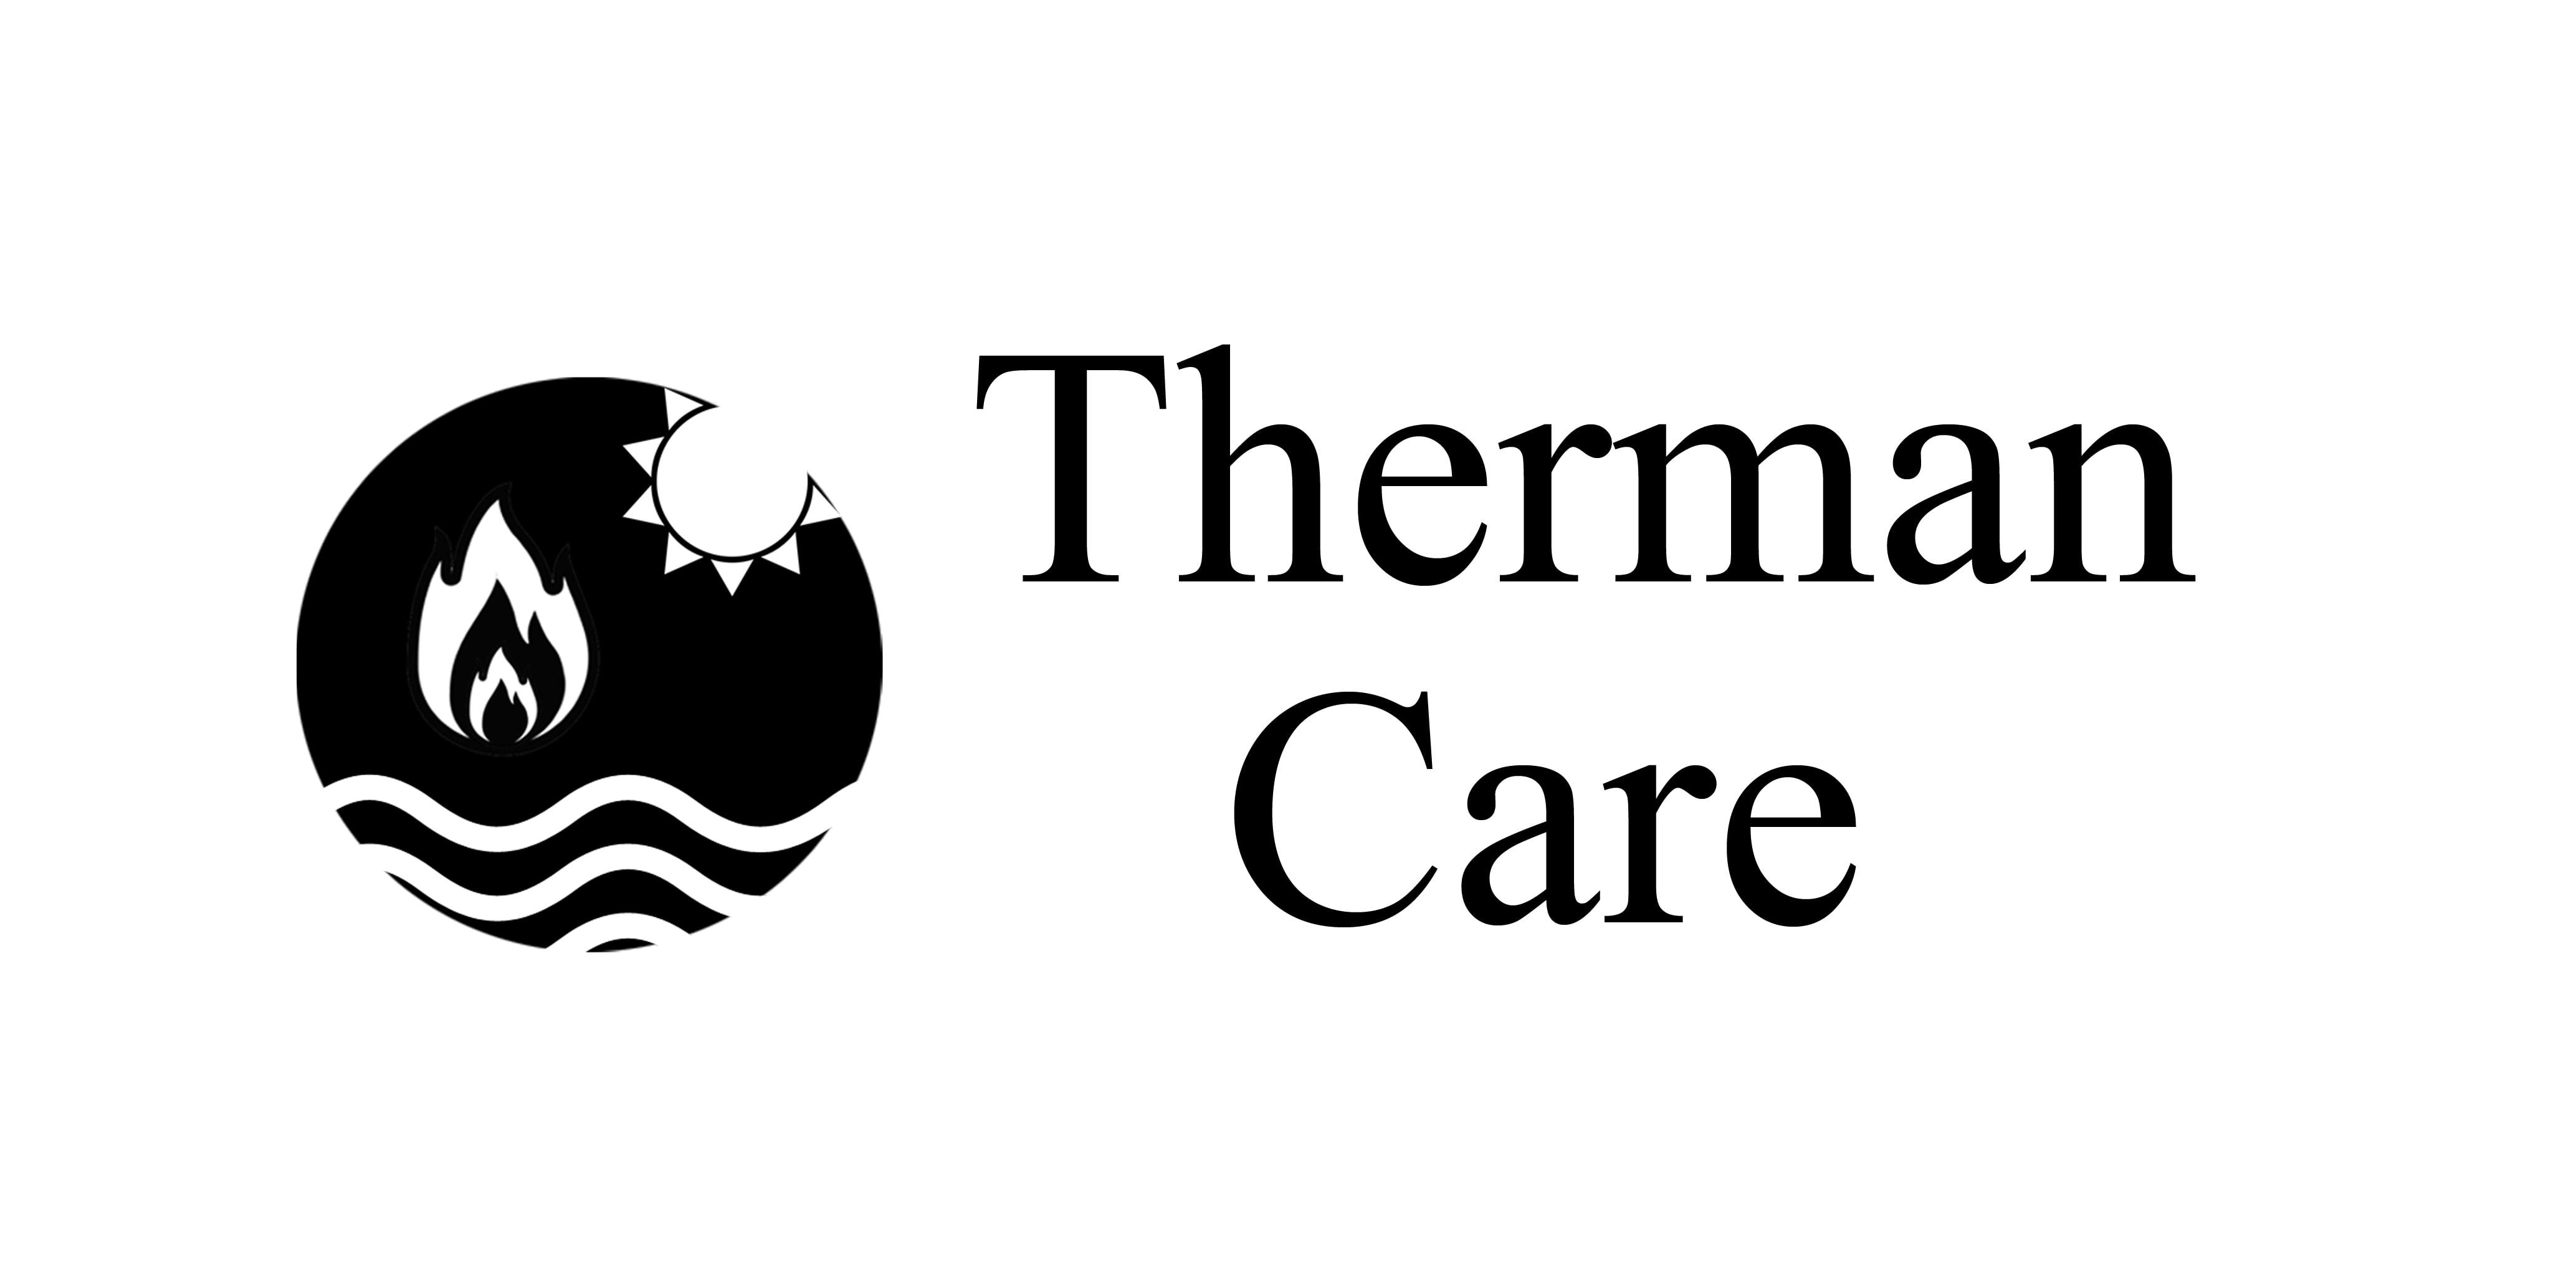 THERMAN CARE - Καυστήρες Φυσικό Αέριο – Ηλιακά Συστήματα